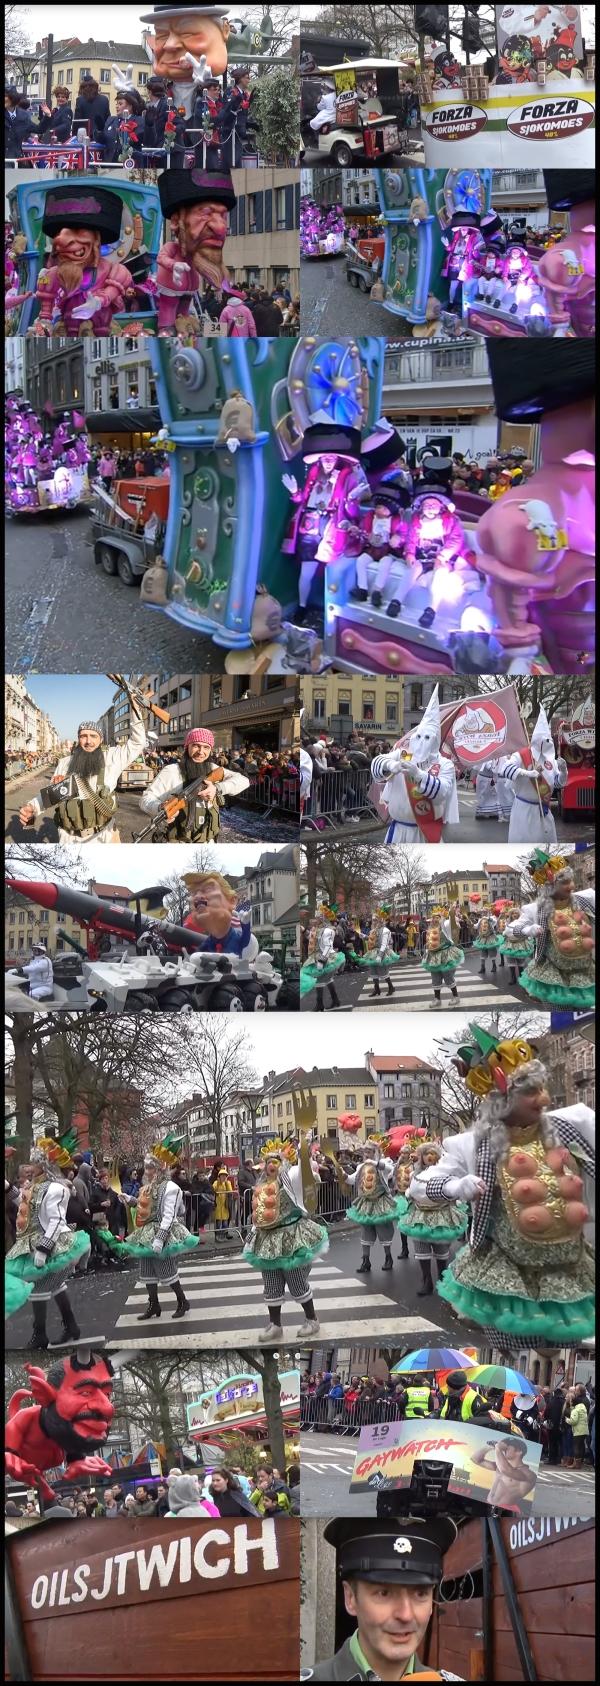 Carnaval d'Alost 2019 Vertical